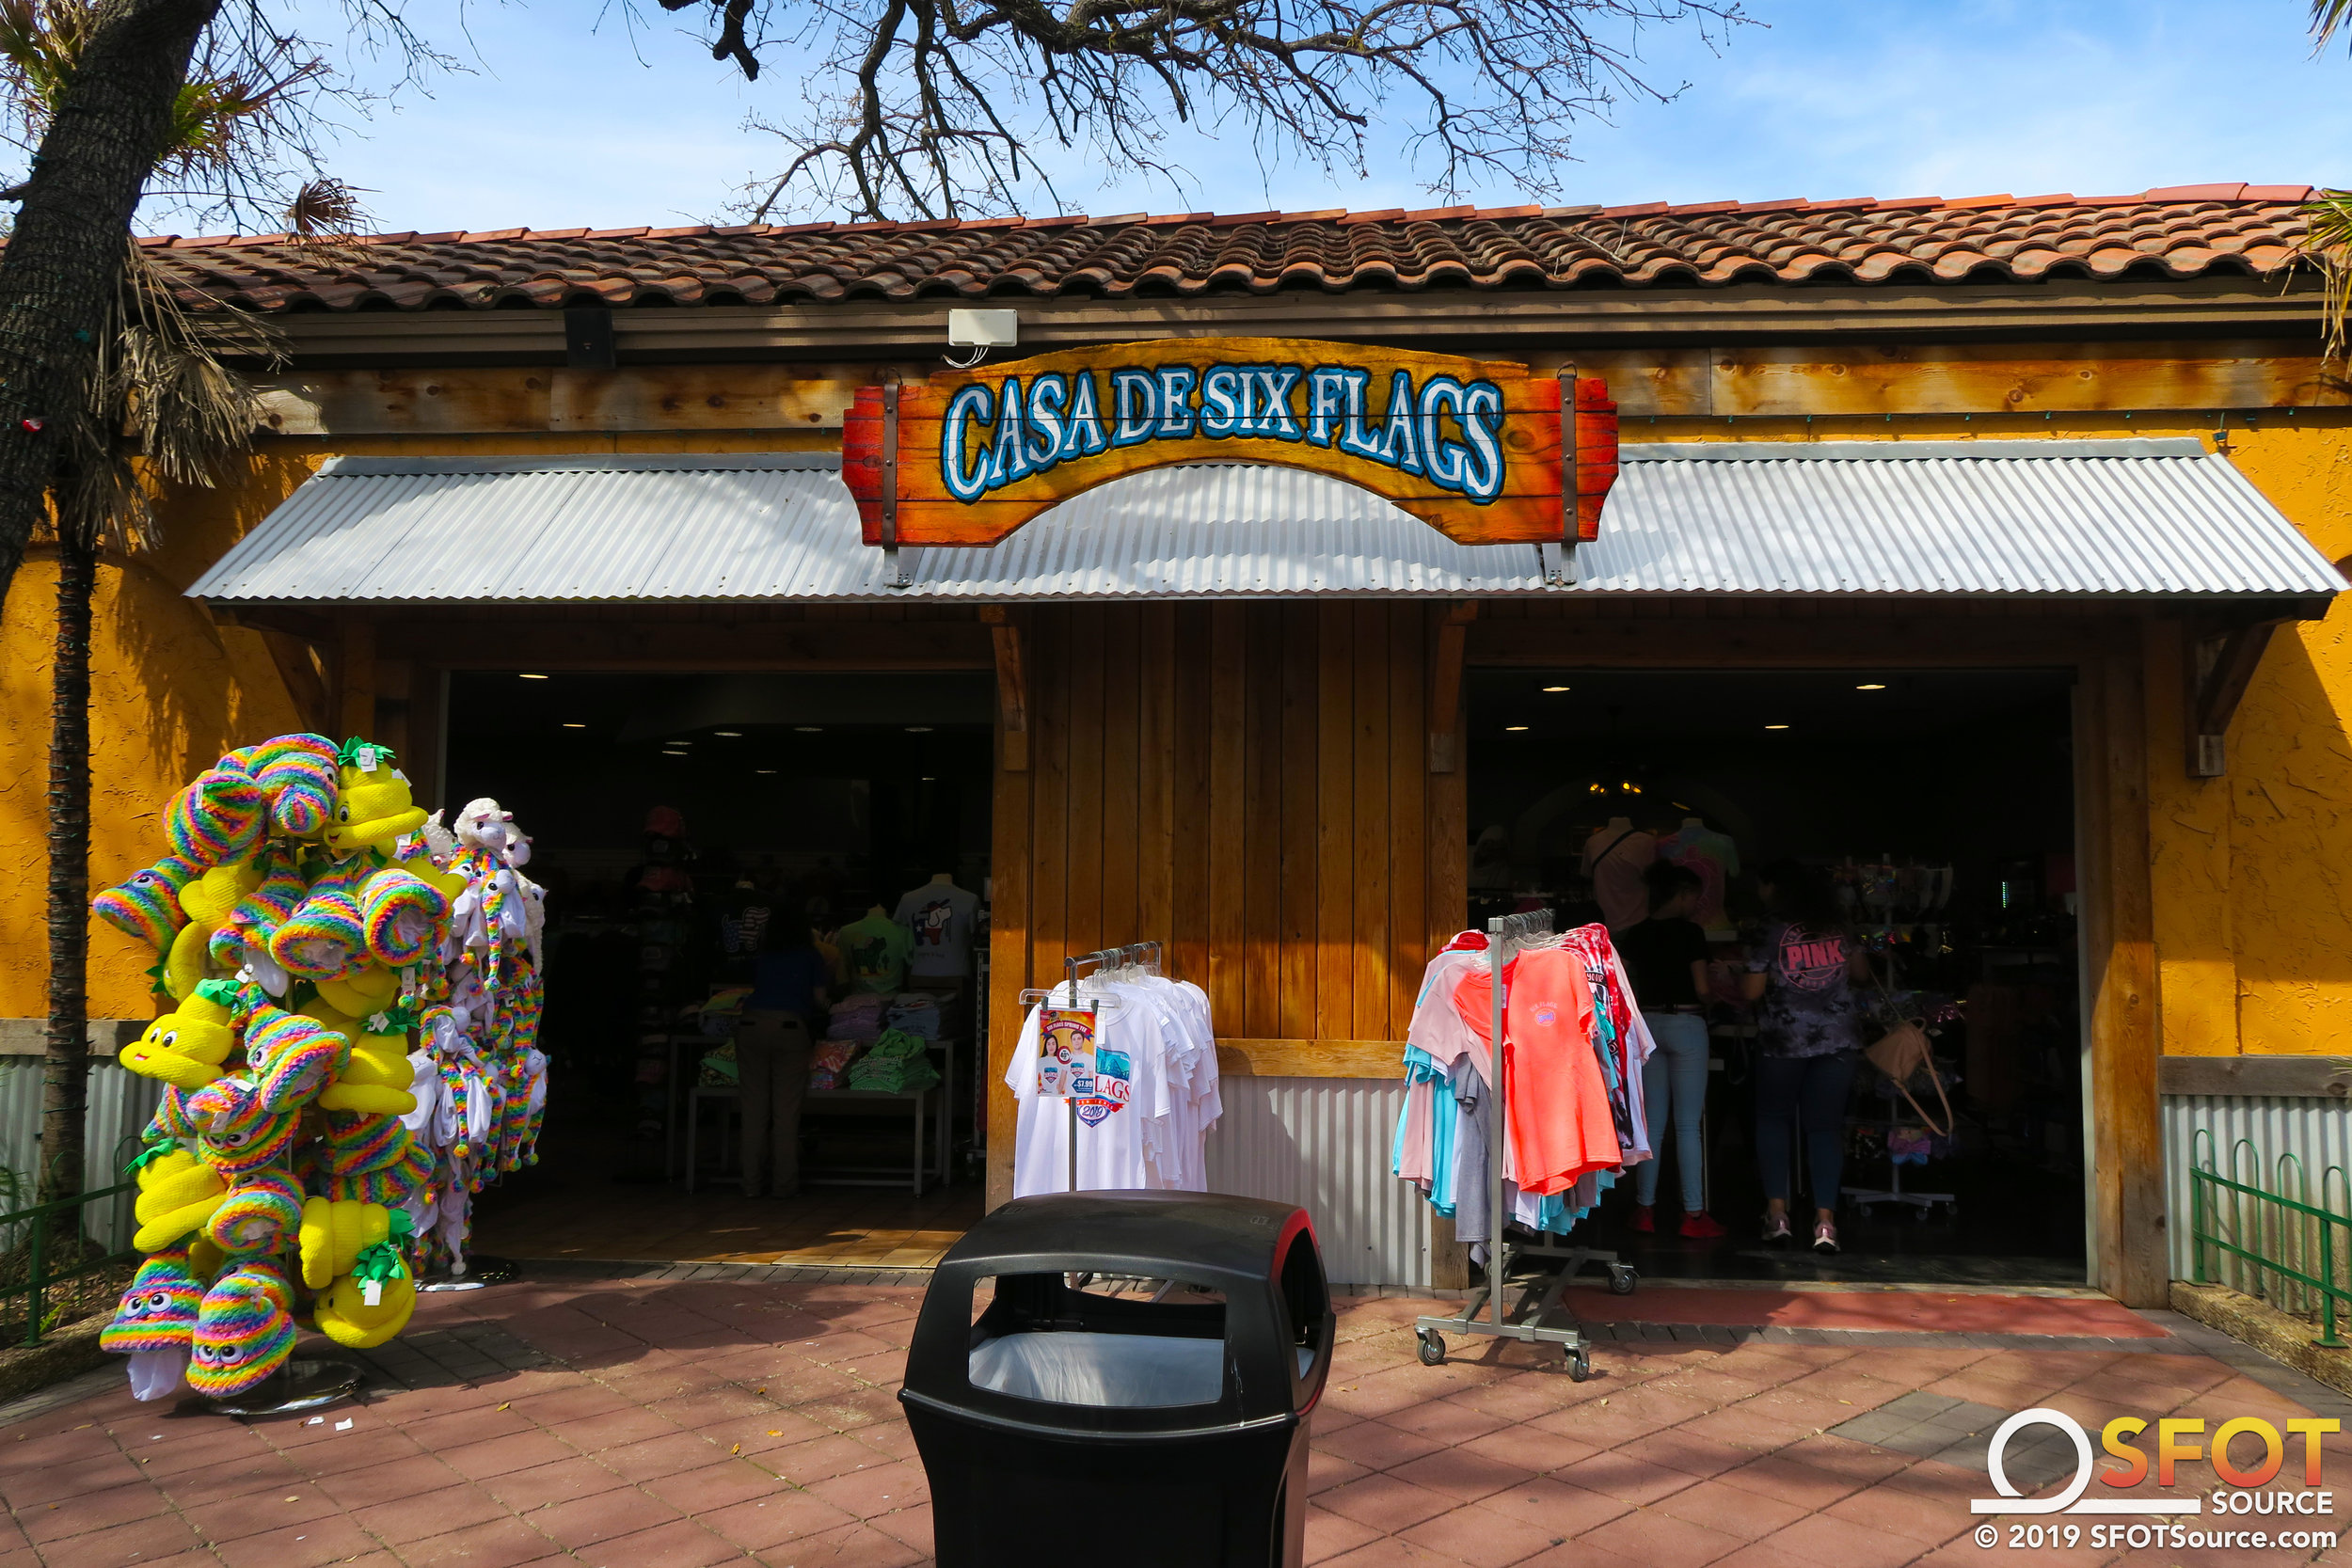 One of three entrances into Casa de Six Flags.